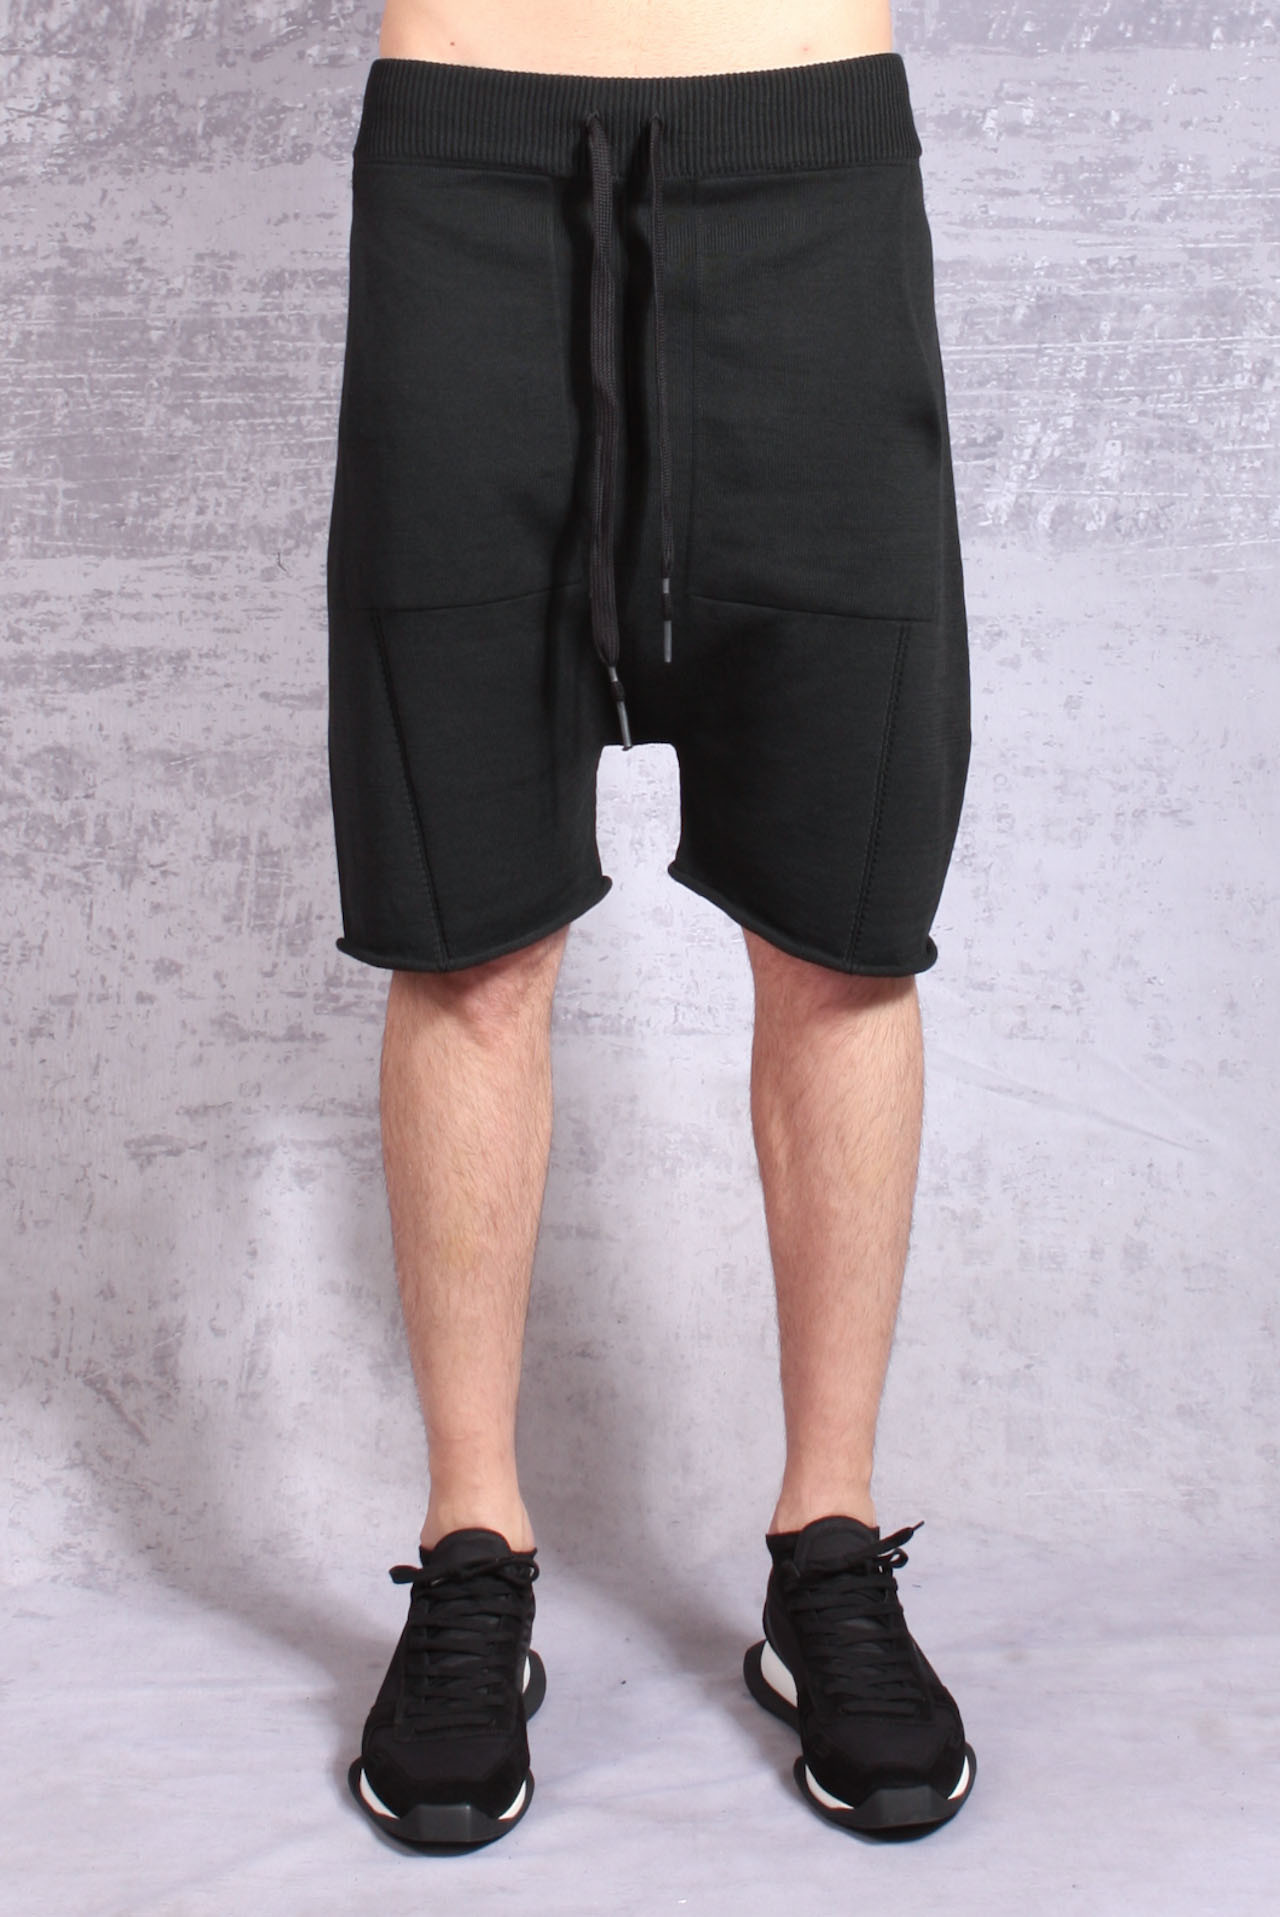 MD75 pants